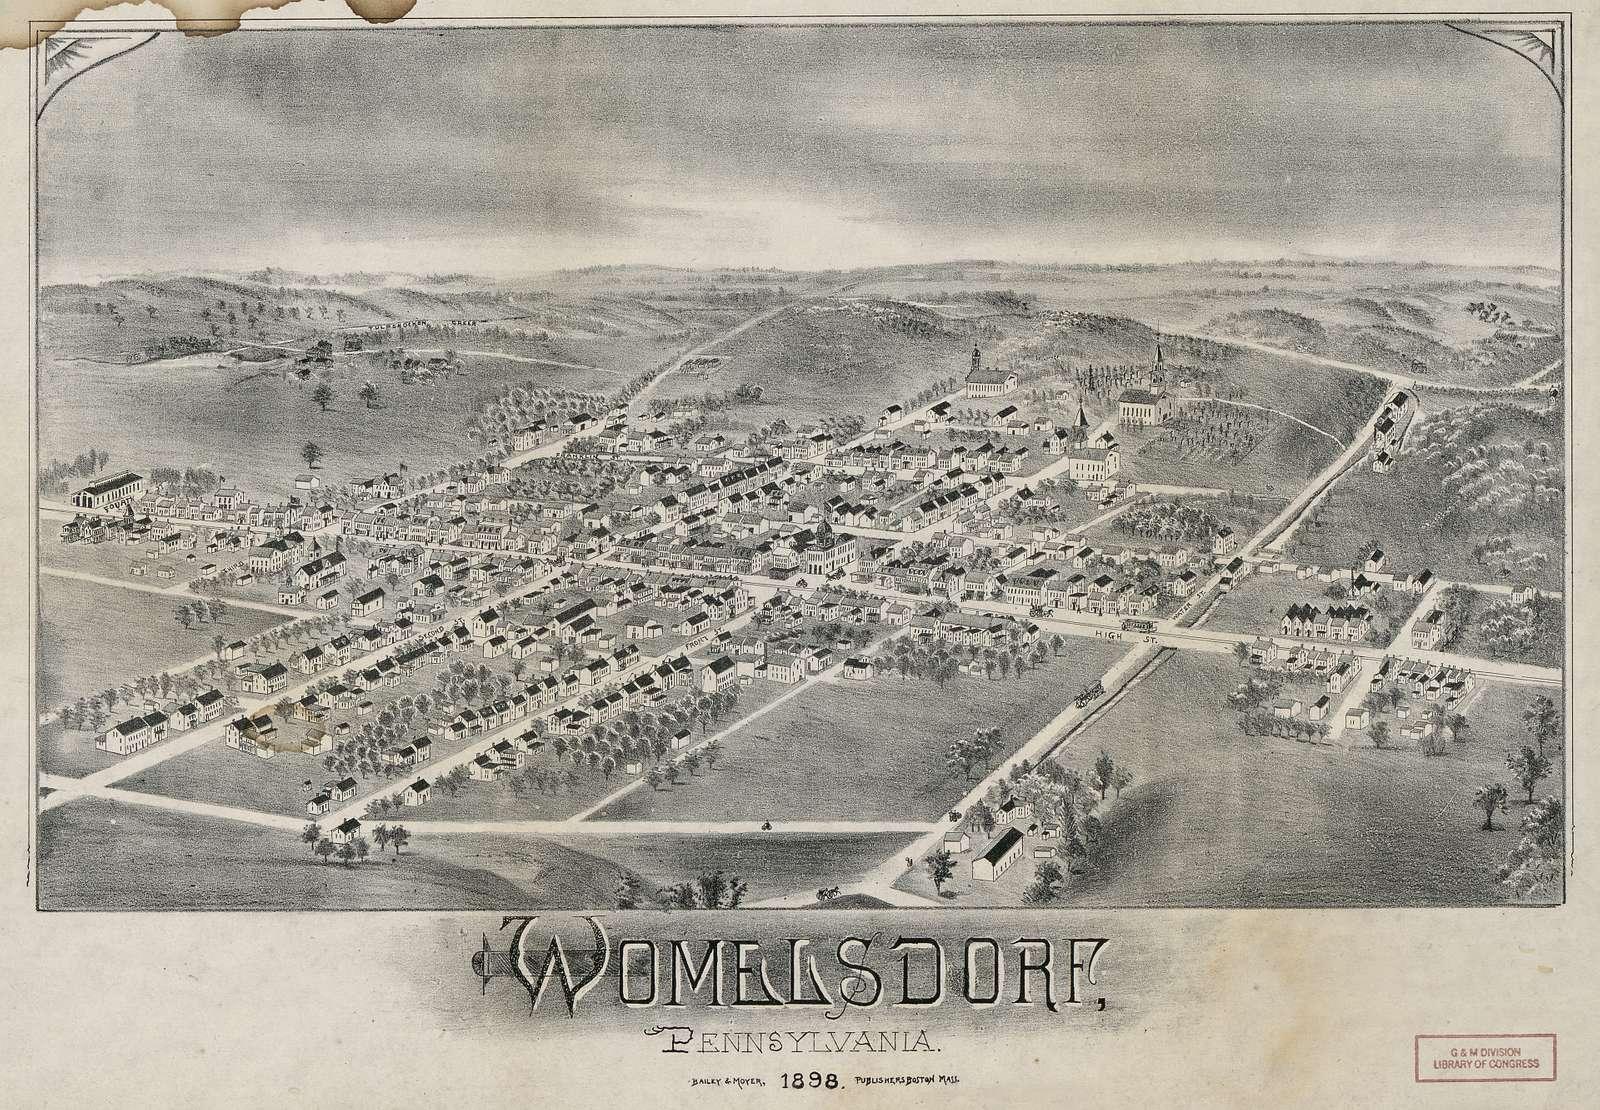 Womelsdorf, Pennsylvania.